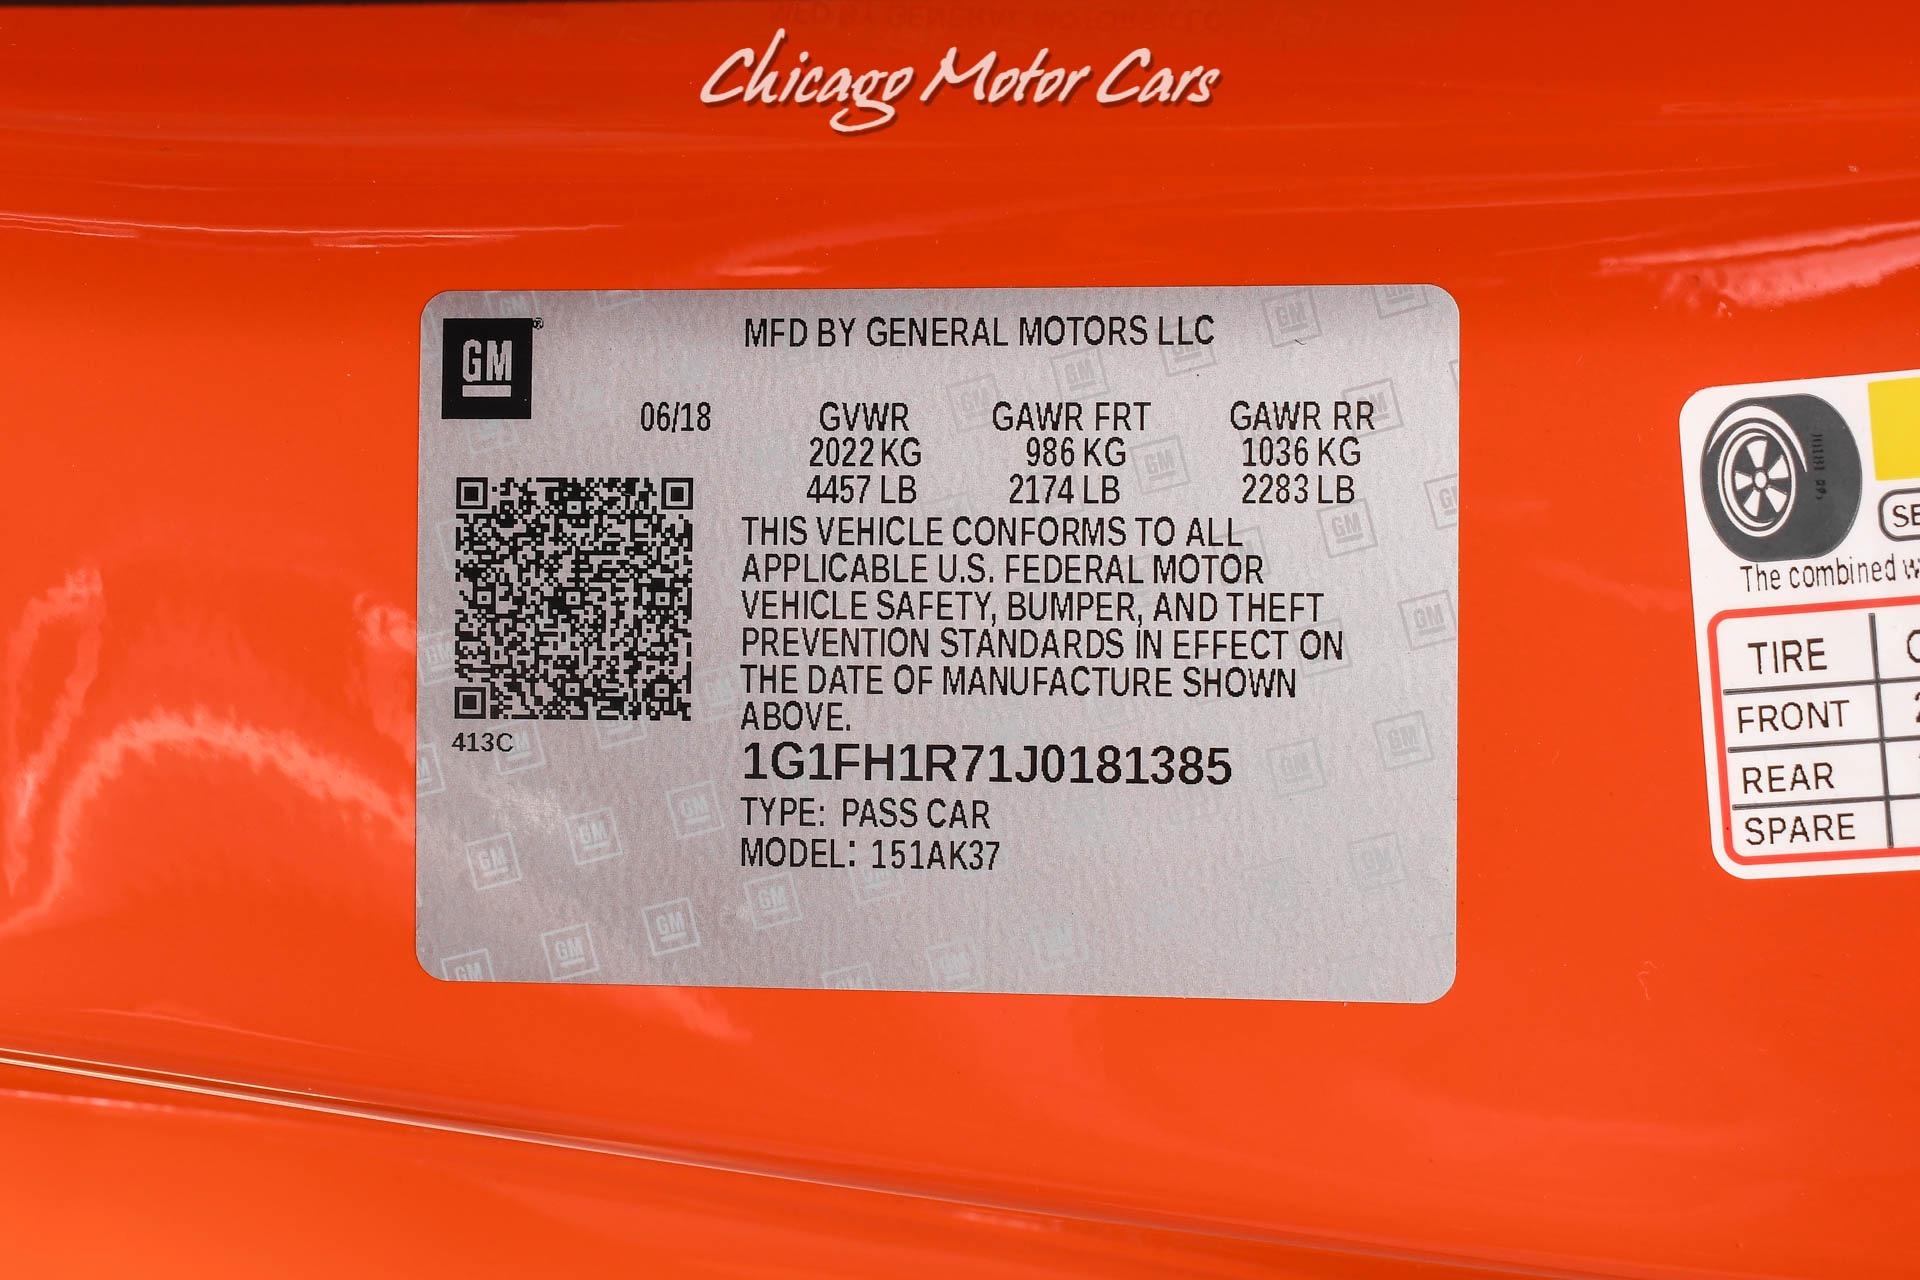 Used-2018-Chevrolet-Camaro-SS-Hot-Wheels-Edition-1500-Miles-Pristine-Condition